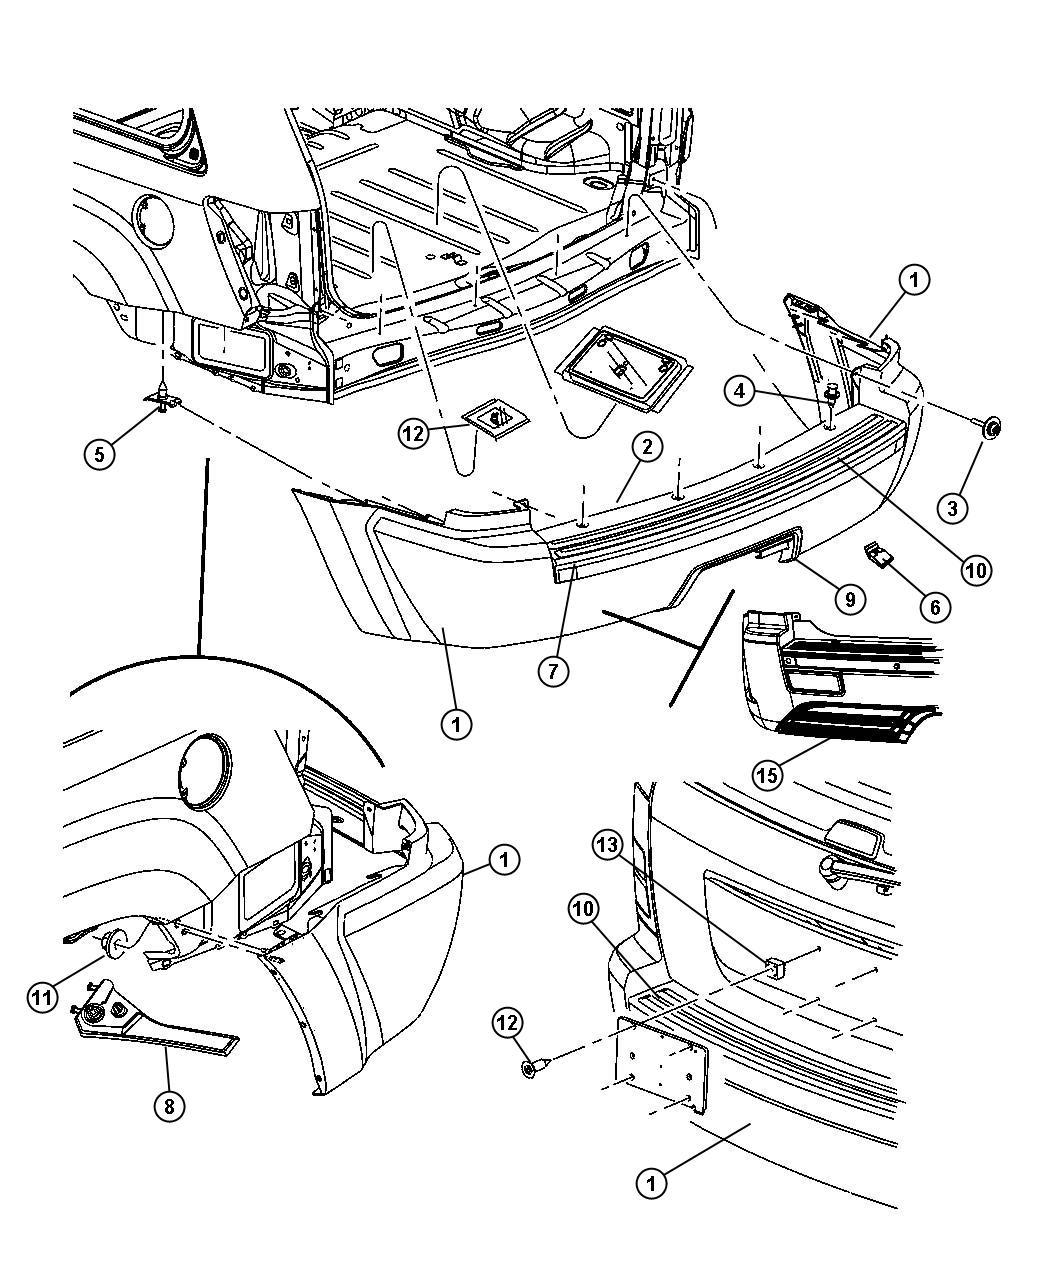 parts#toyota 4runner rear bumper parts#mazda 3 rear bumper parts#nissan  xterra rear bumper parts#2011 chrysler 300 with rims#2011 chrysler 200 body  kits � �